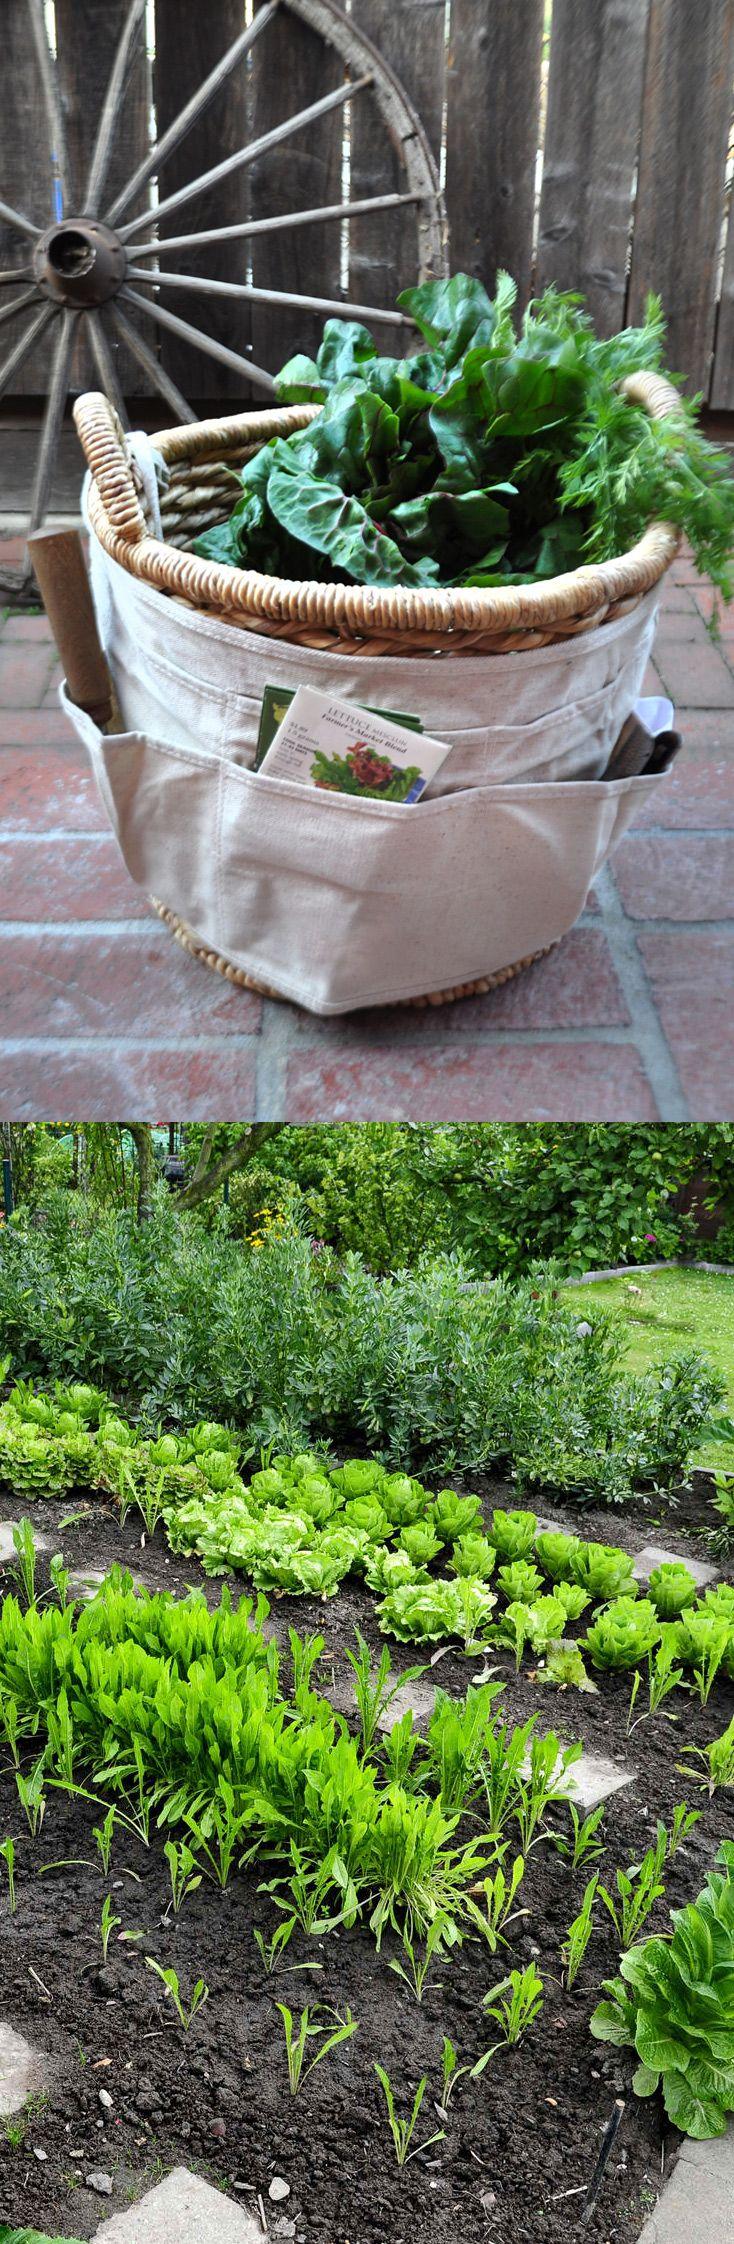 Diy Garden Projects 46 Best Garden Diy Ideas Images On Pinterest